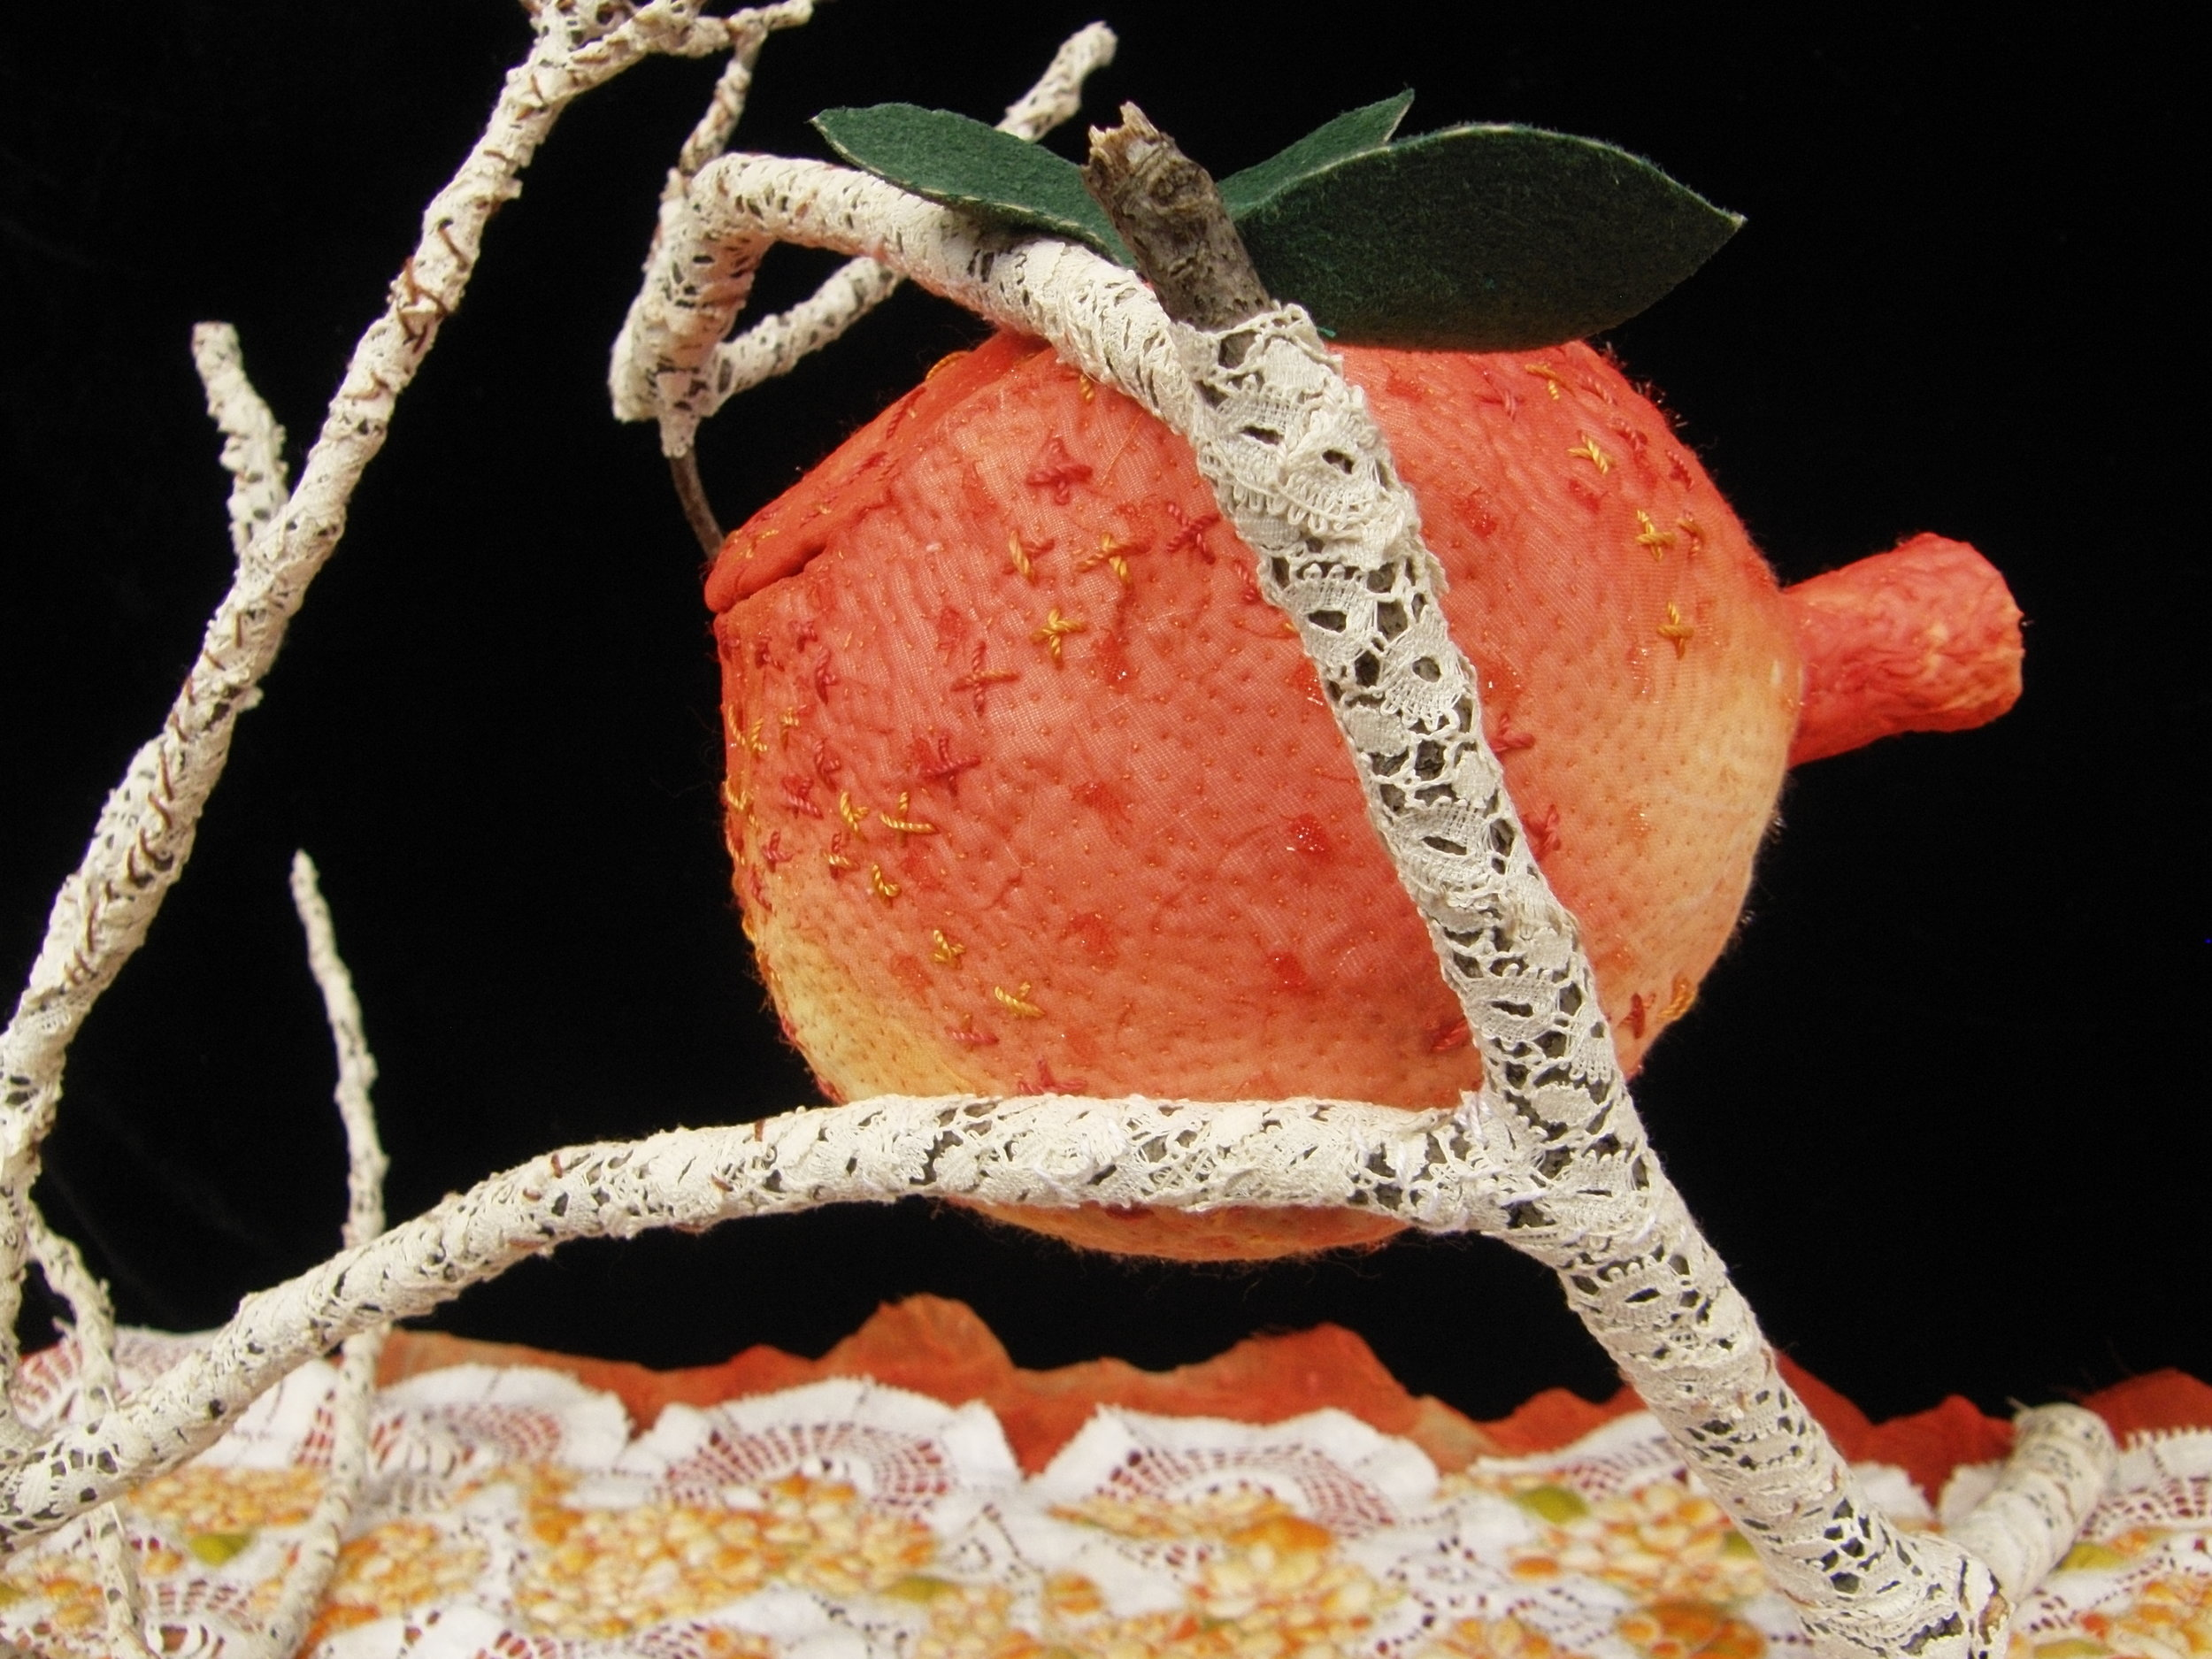 Mary_Beth_Bellah_Orange_Blossom_Tea_detail.jpg